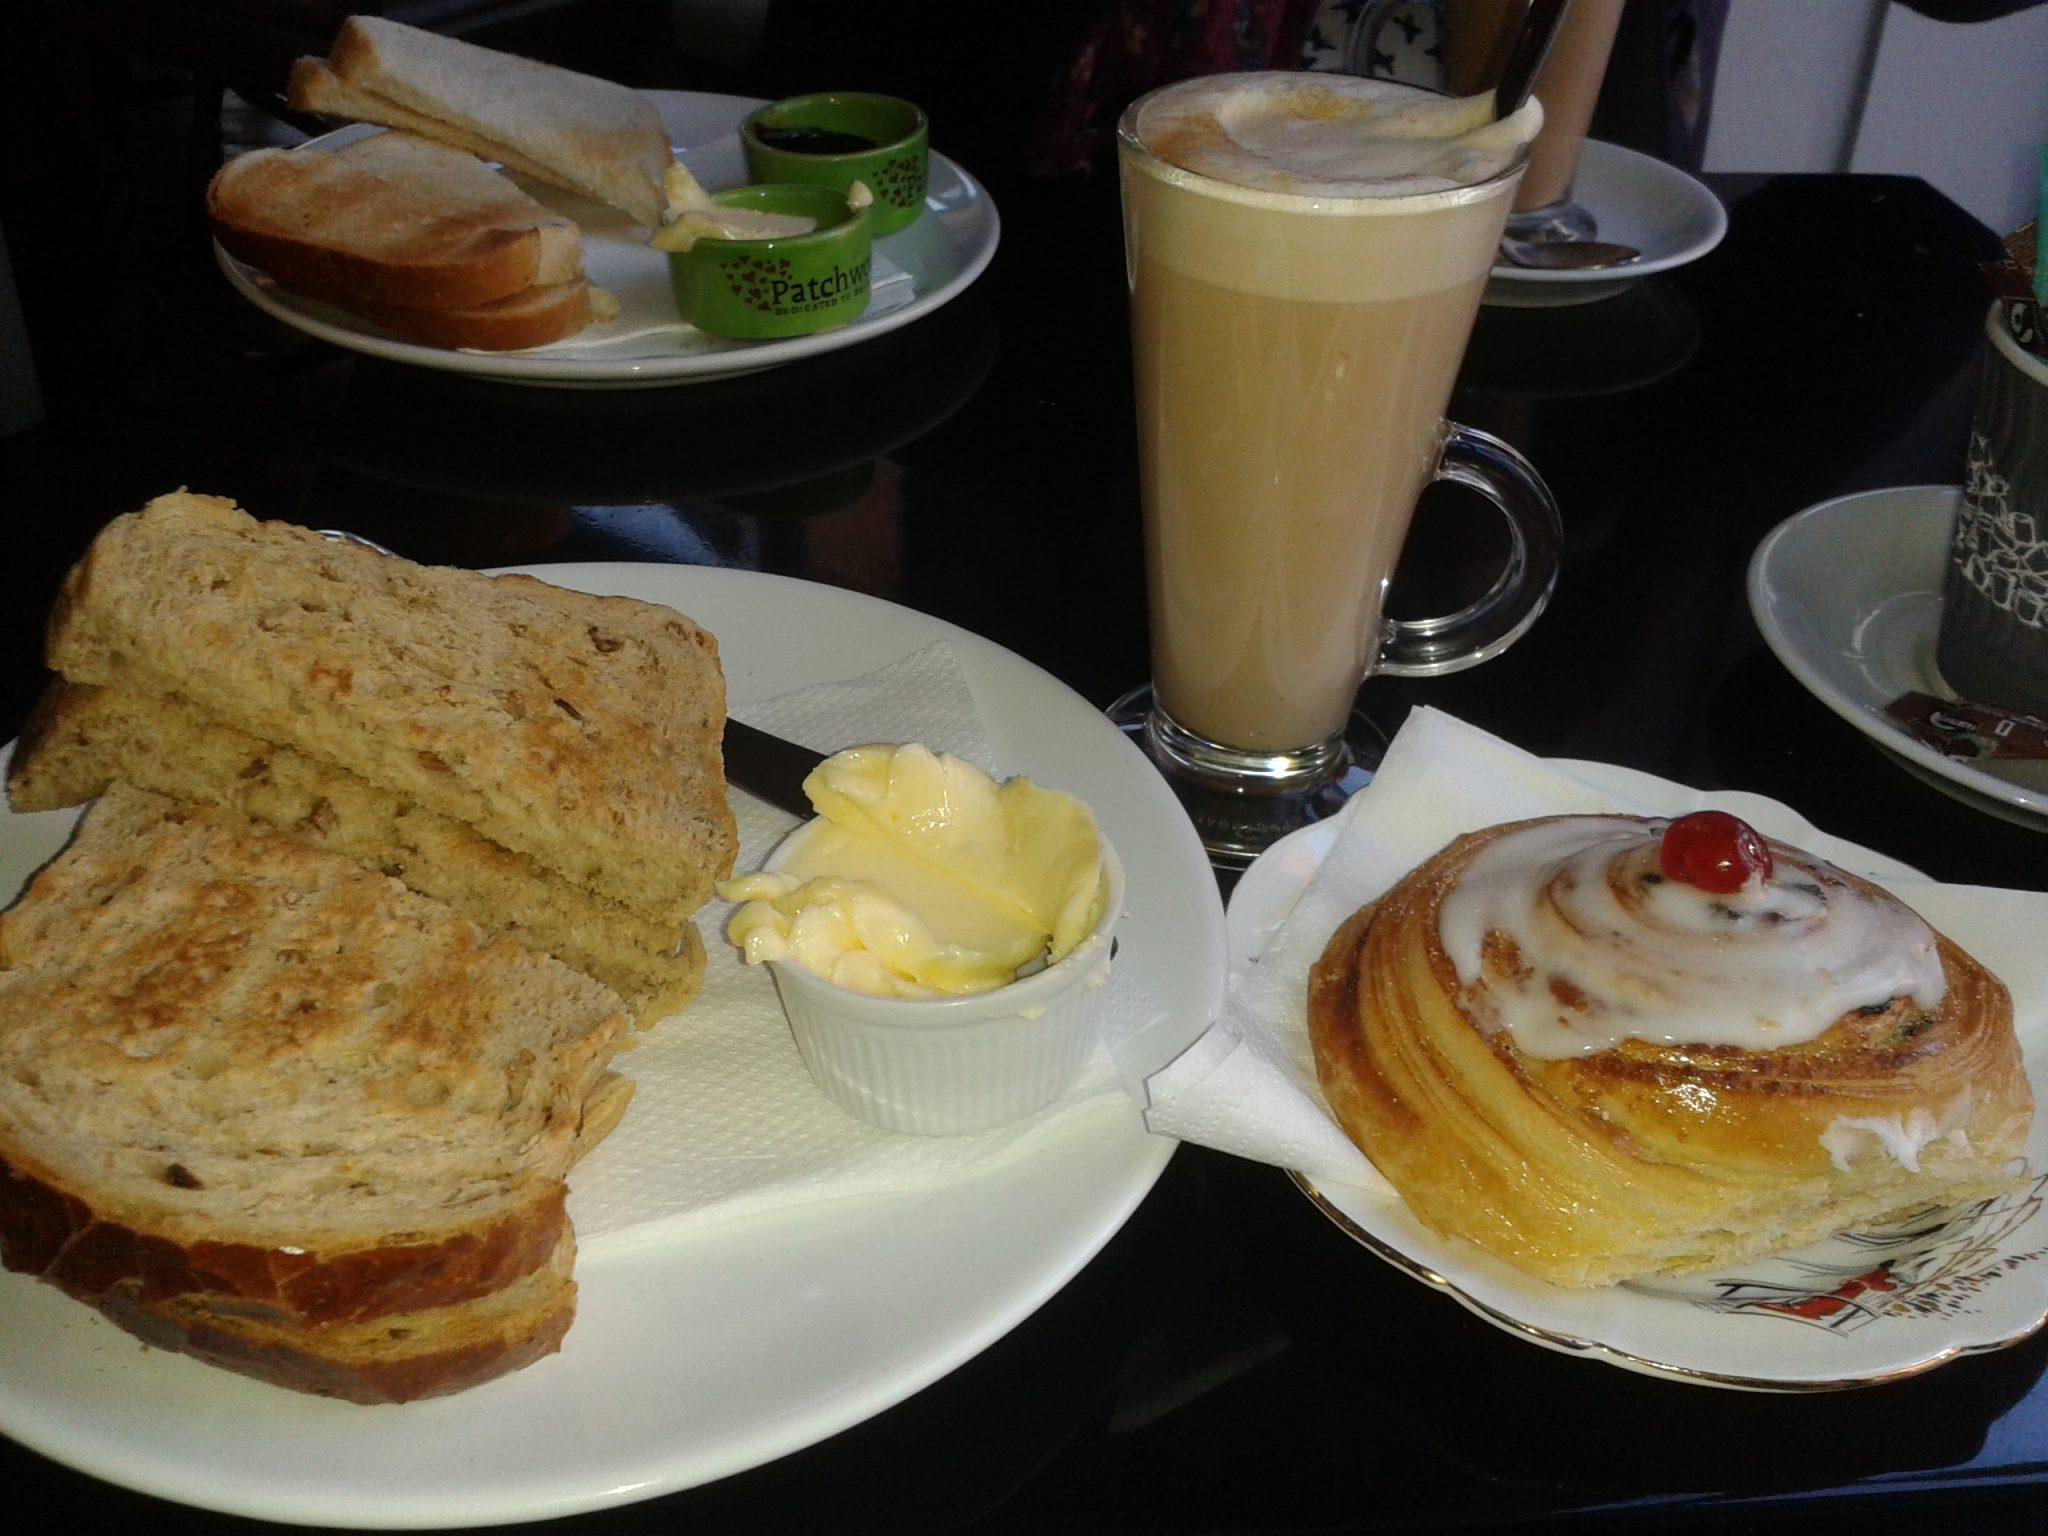 Coffee Crawl Meet-up (Local Guides Google): Saturday 18th June, 2pm